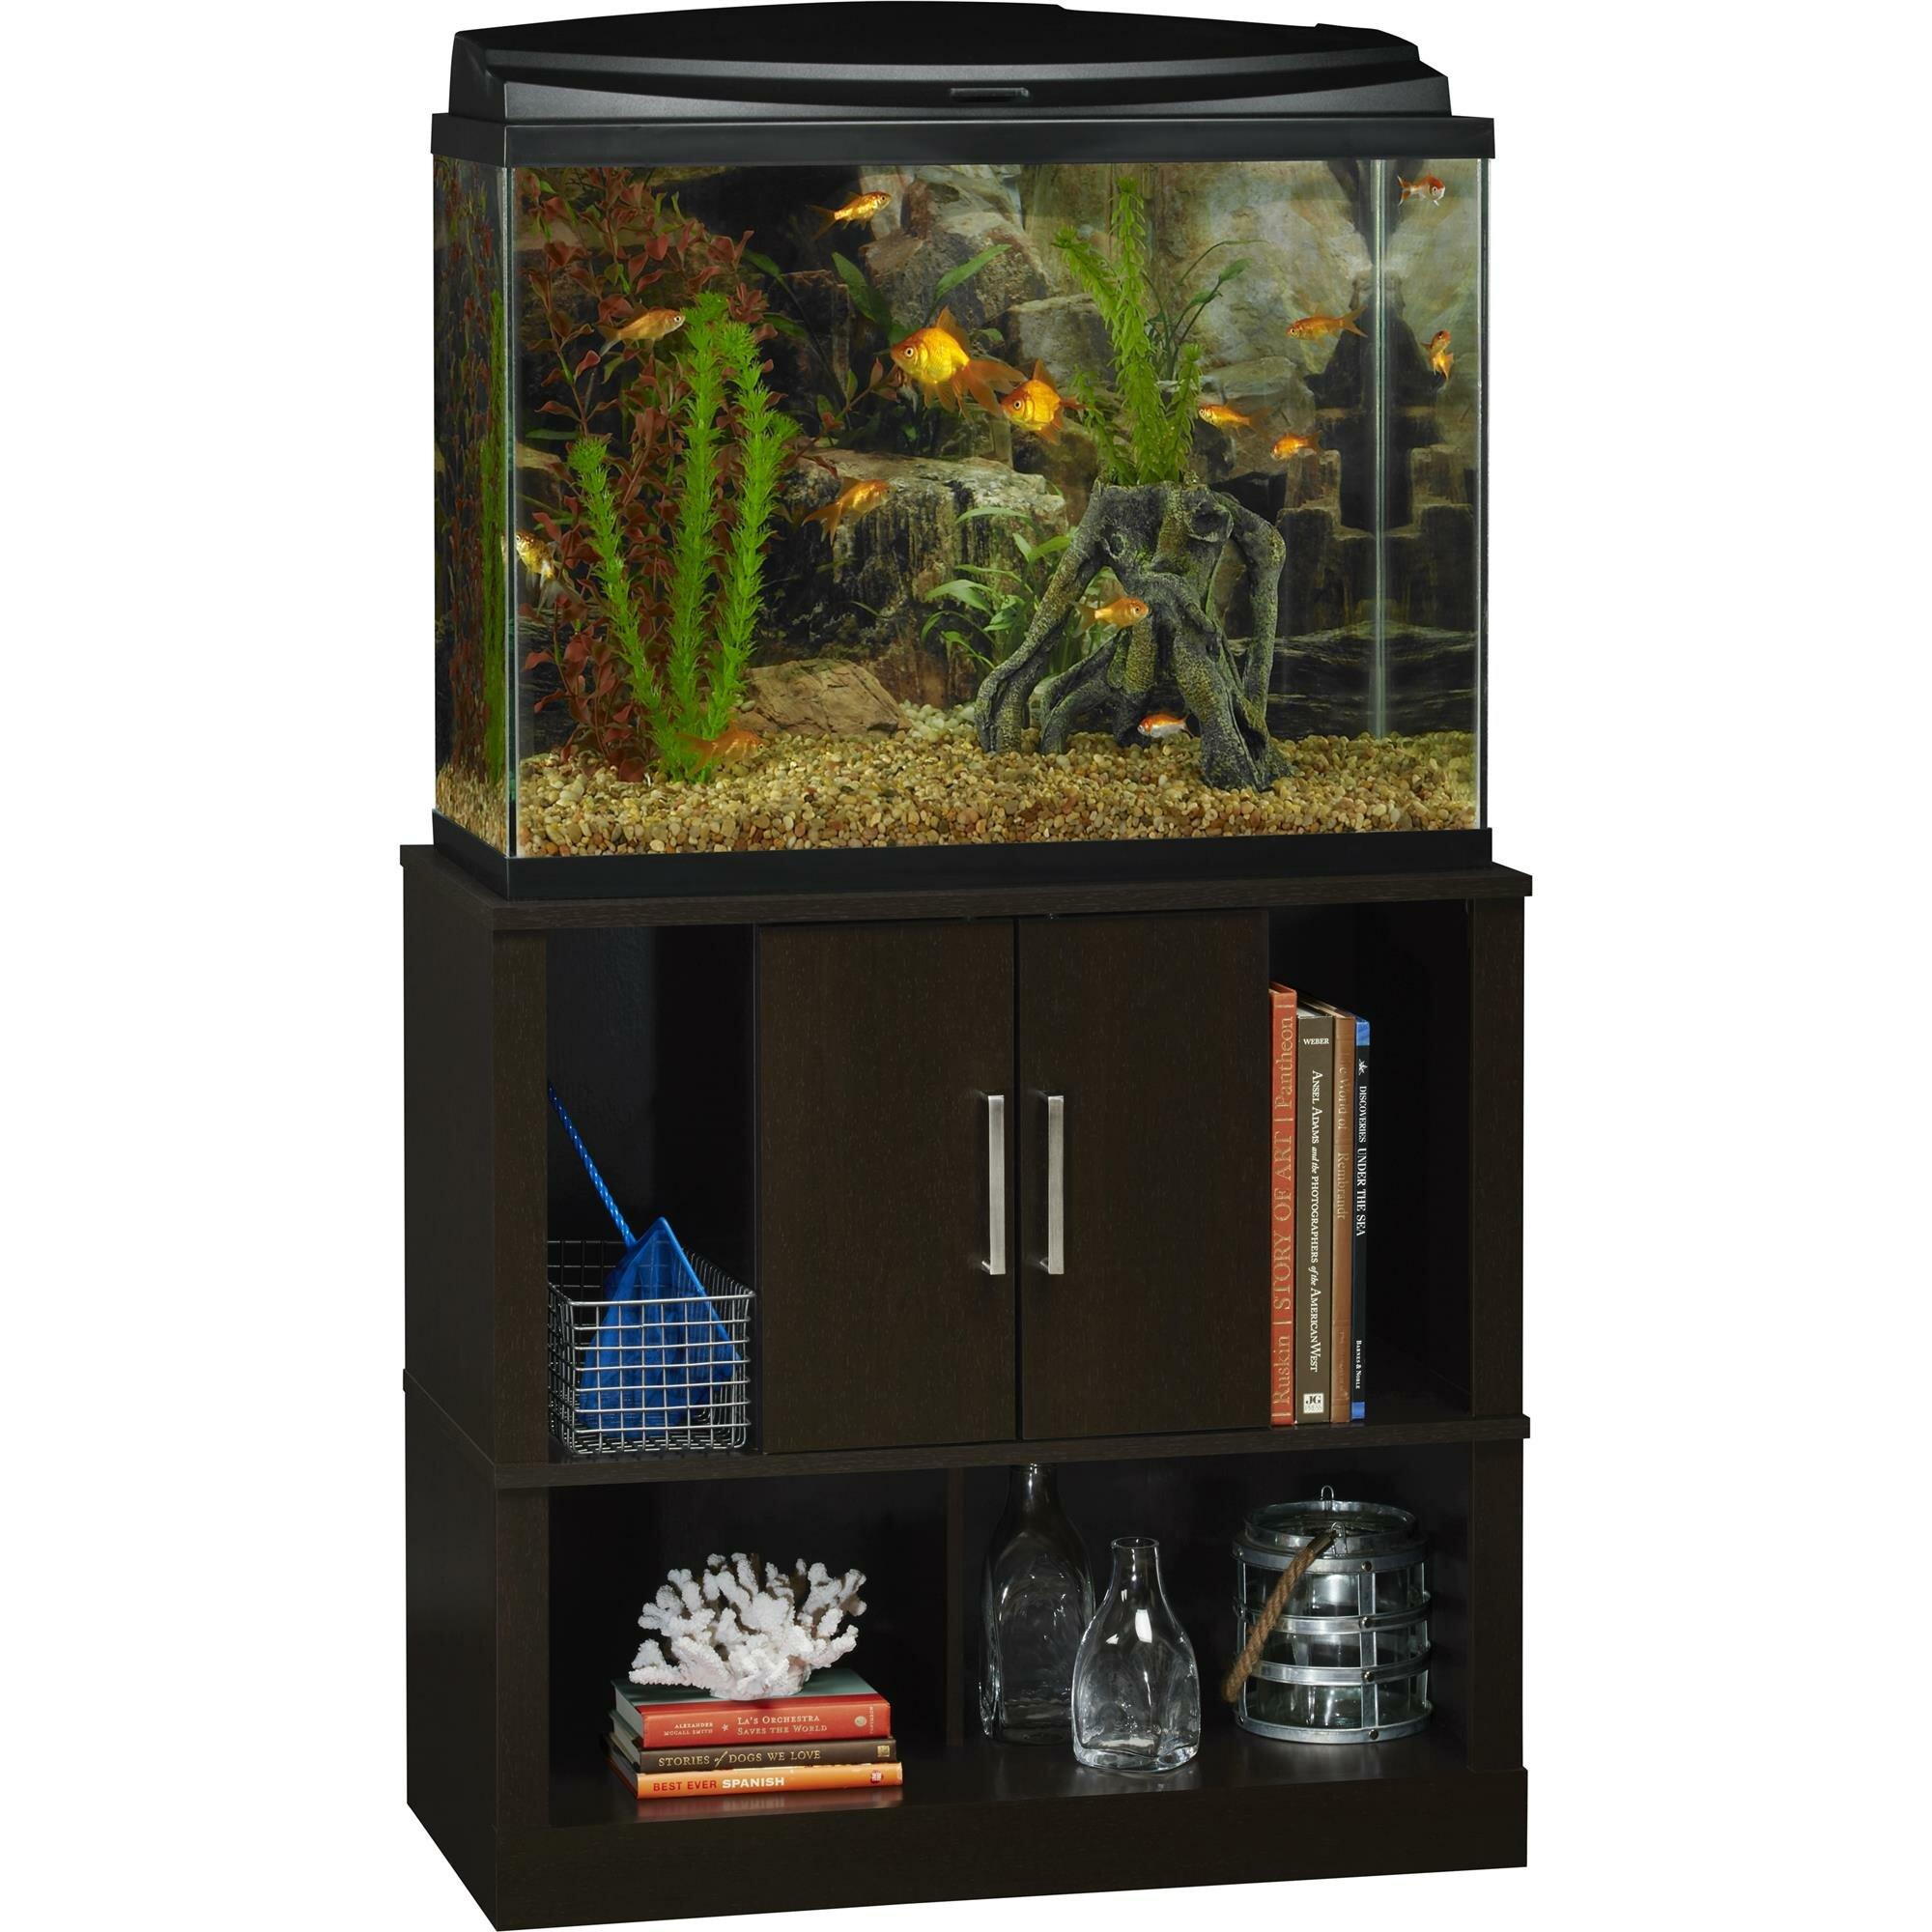 Altra laguna tide 37 gallon aquarium stand reviews wayfair for 37 gallon fish tank